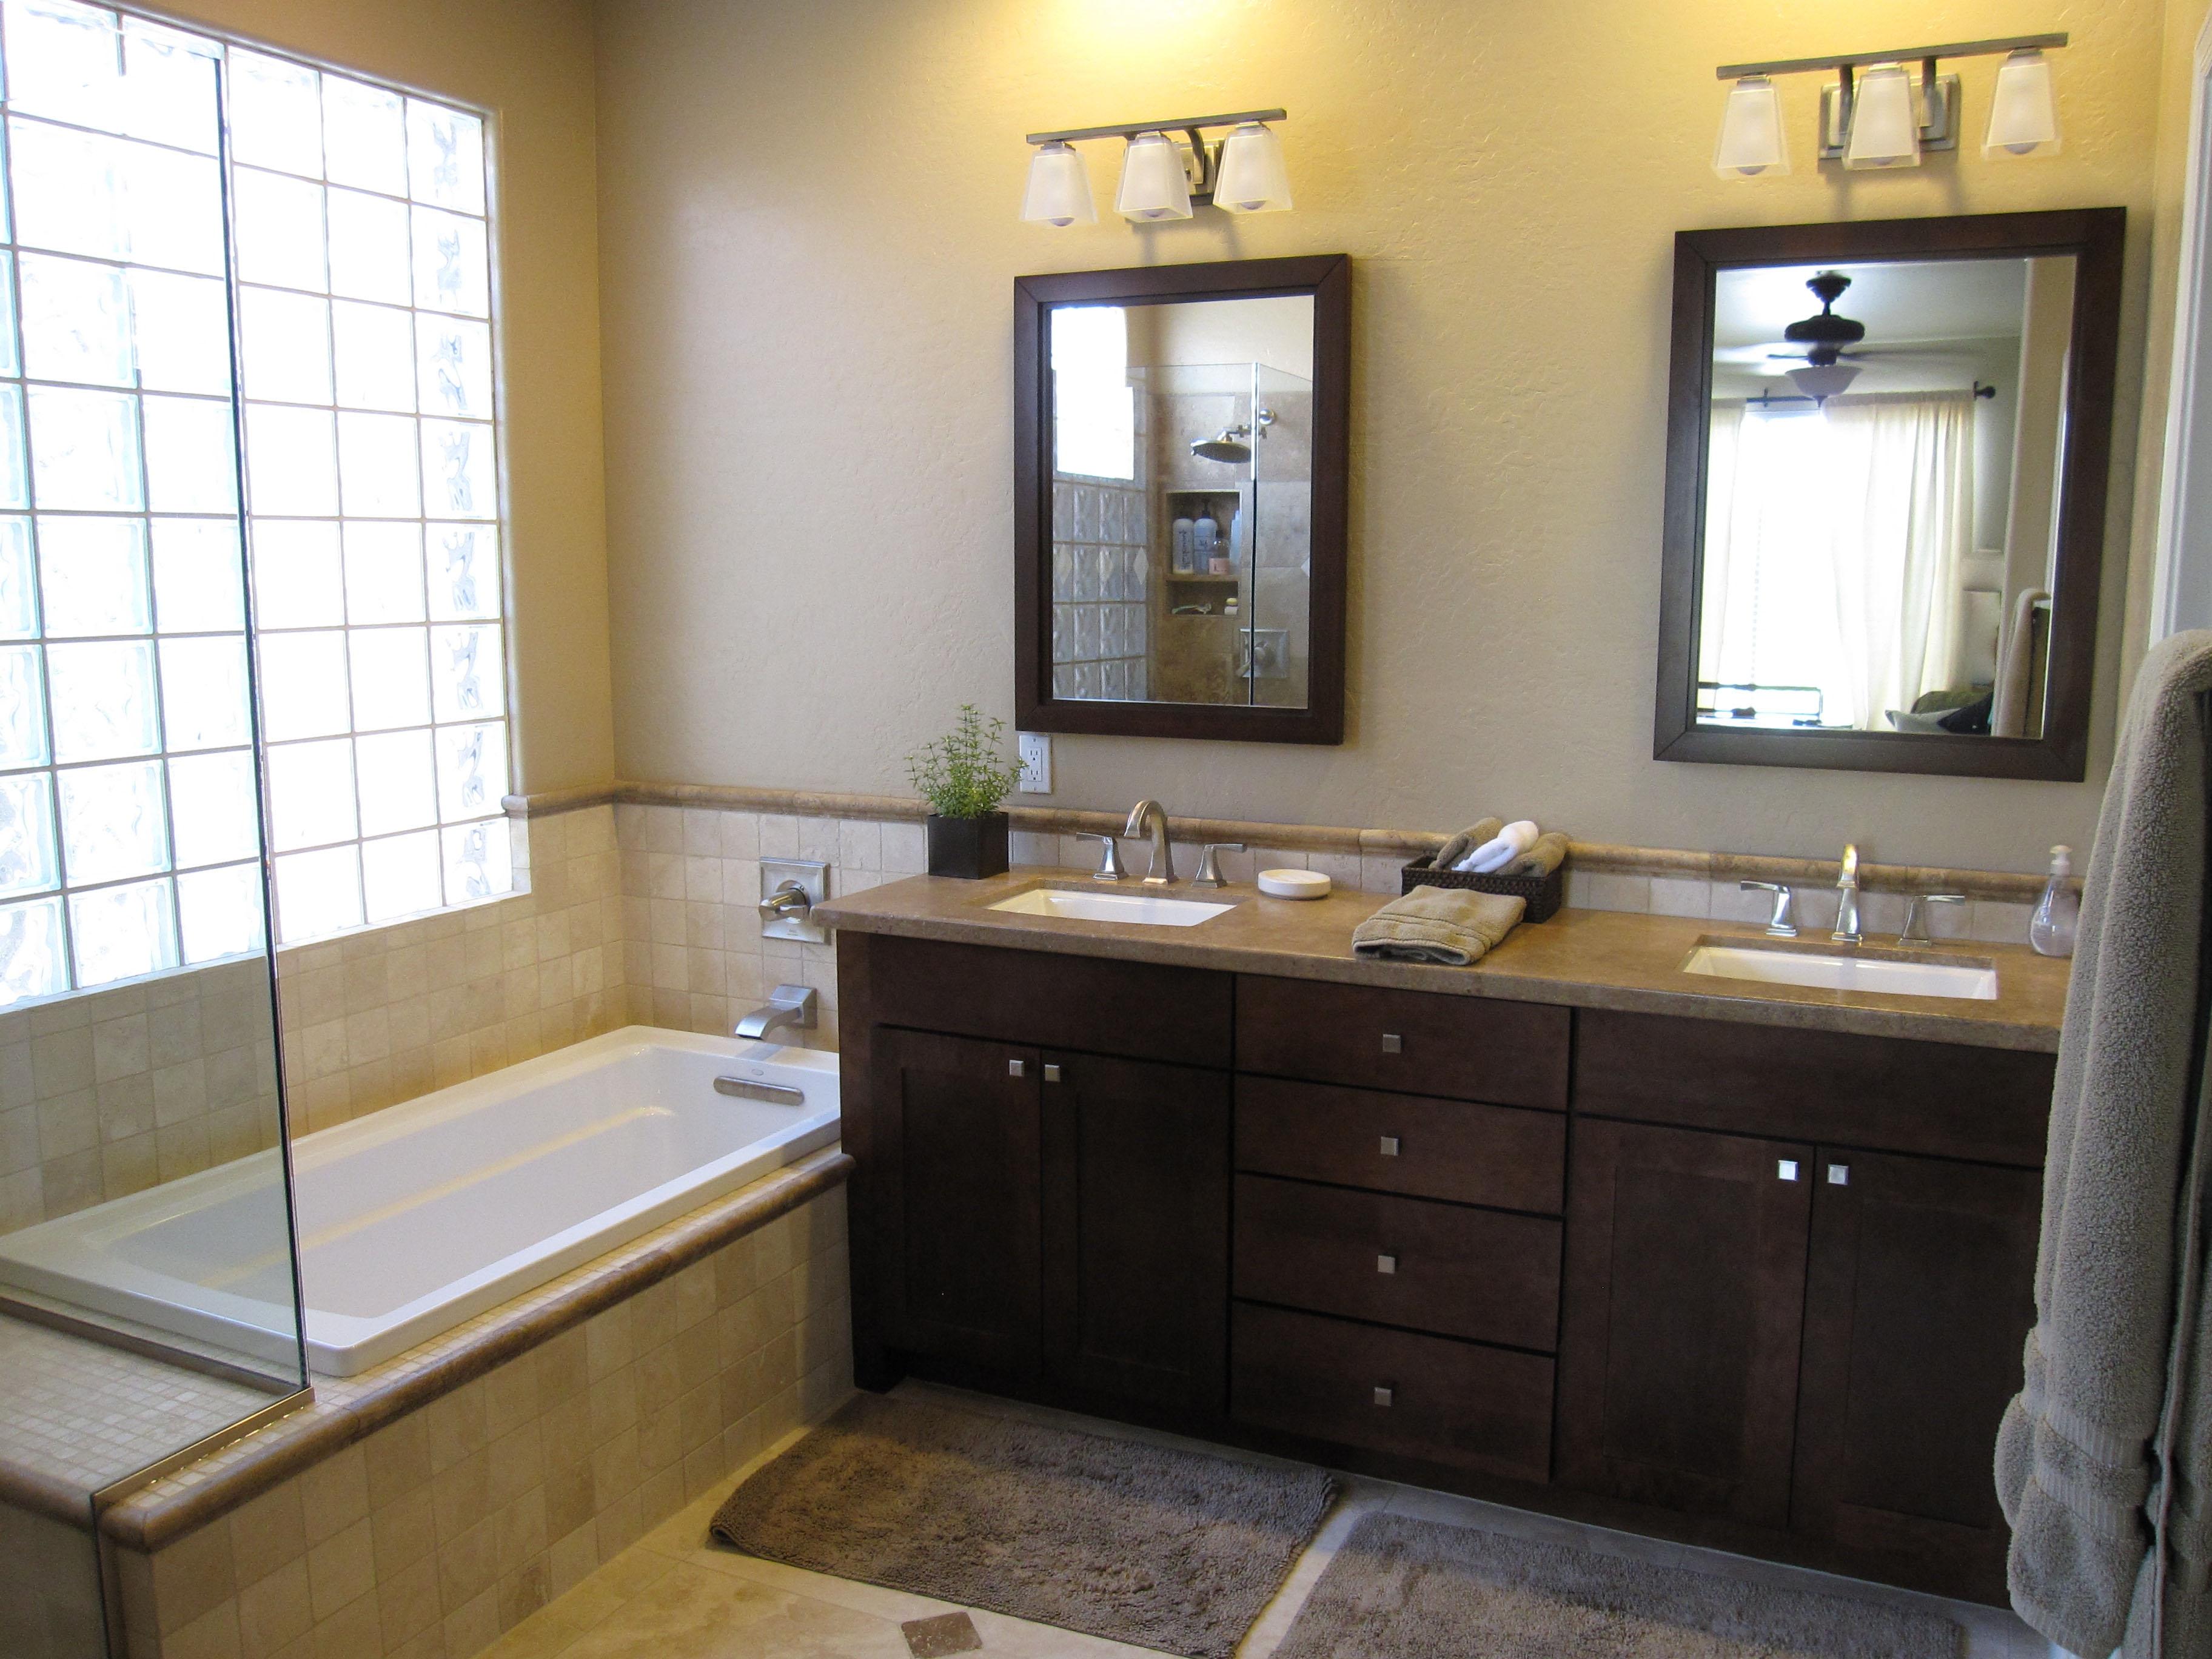 Small Bathroom Mirror Size